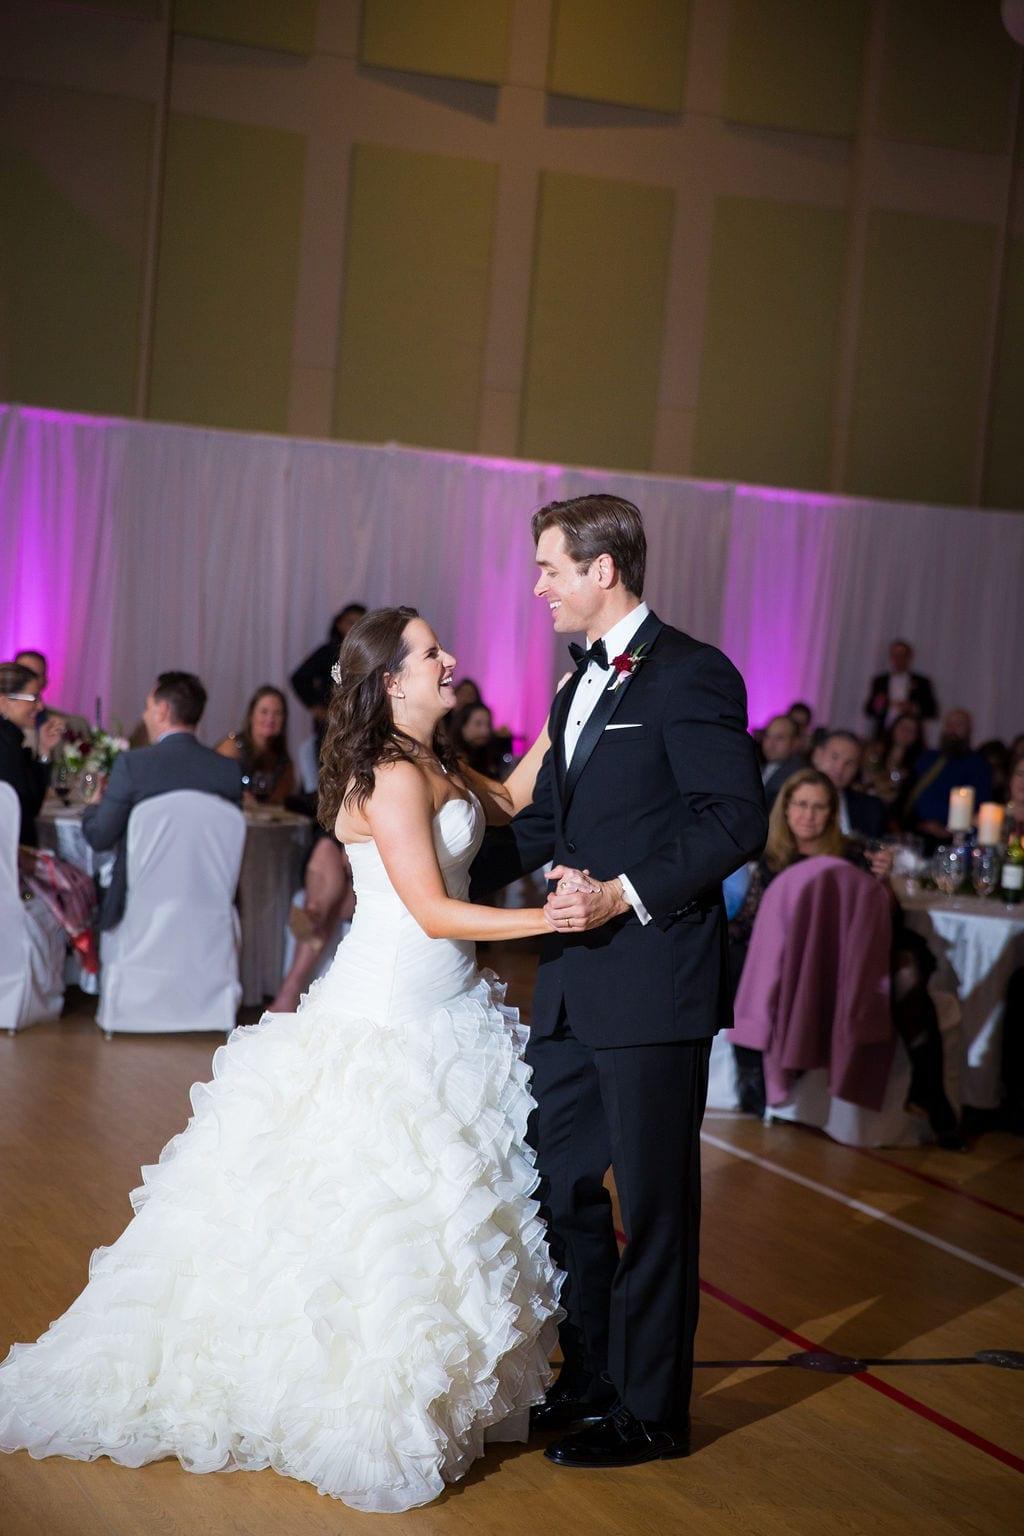 Ashley - Josh's wedding reception first dance laughing